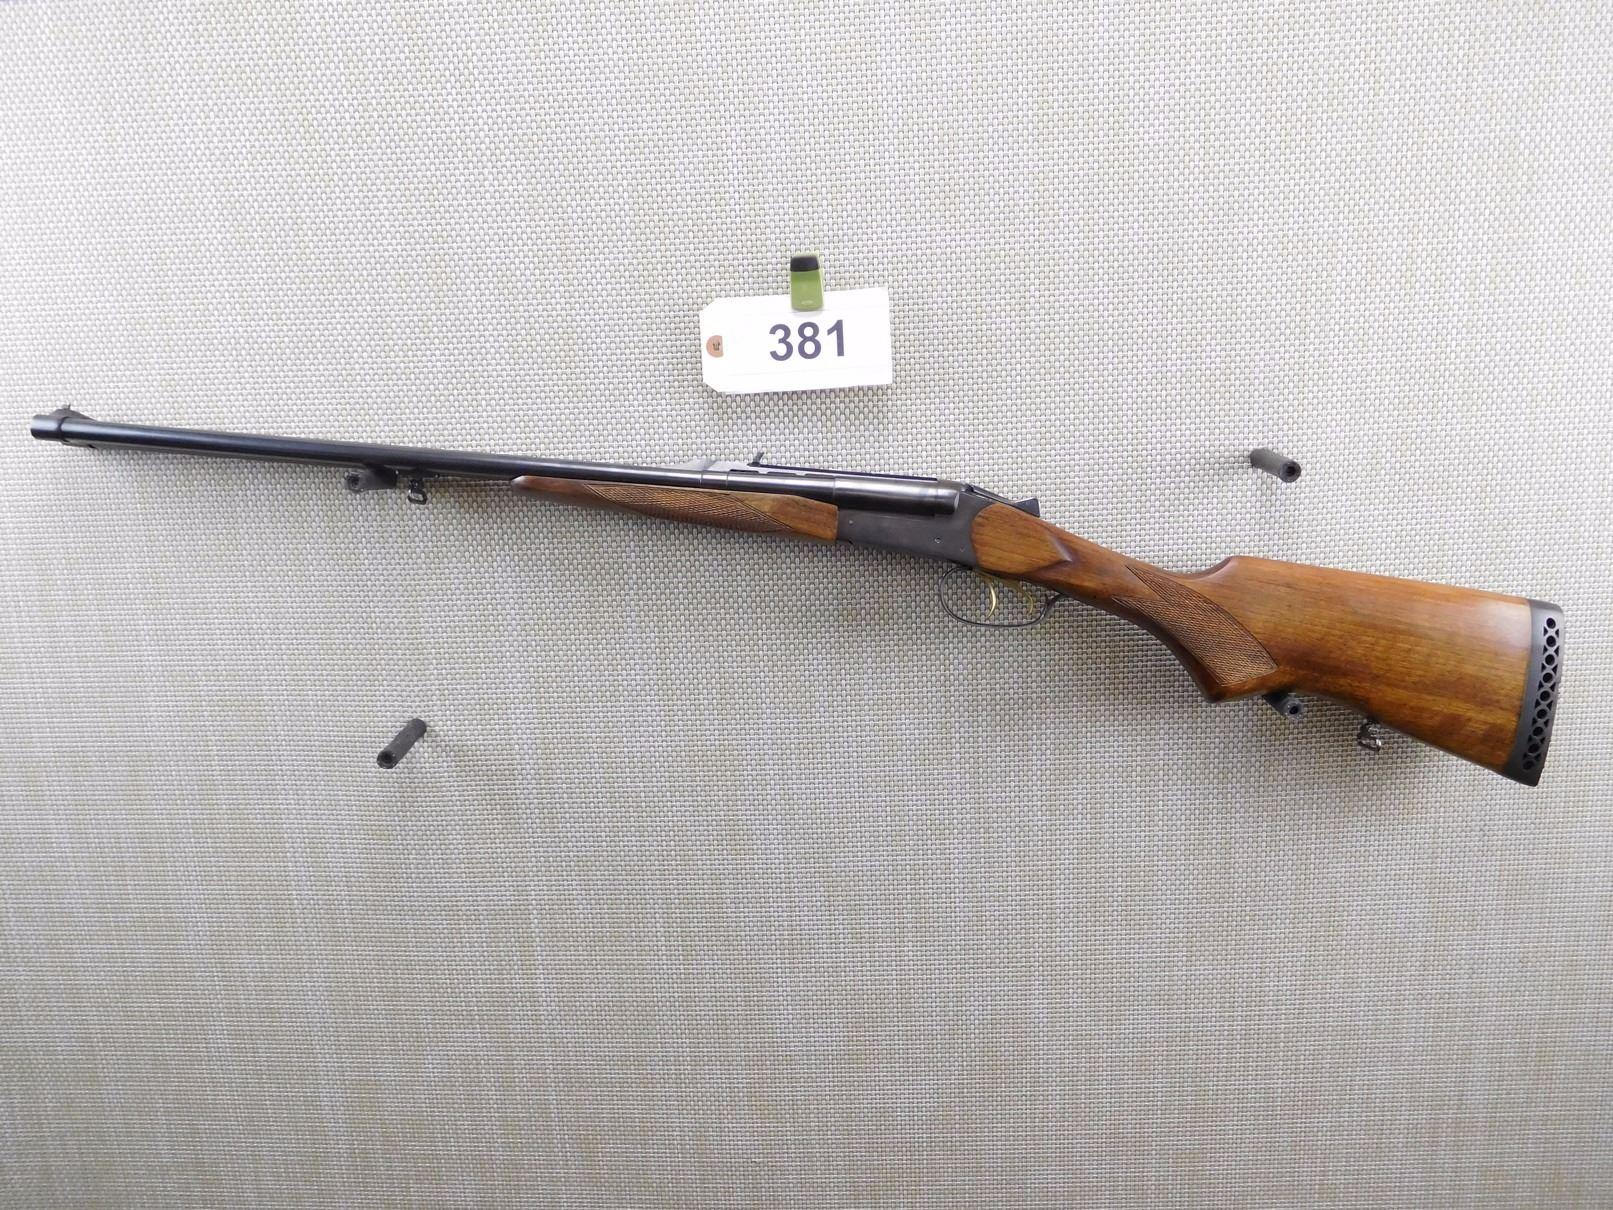 BAIKAL , MODEL: MP-221 , CALIBER: 45-70 GOVT